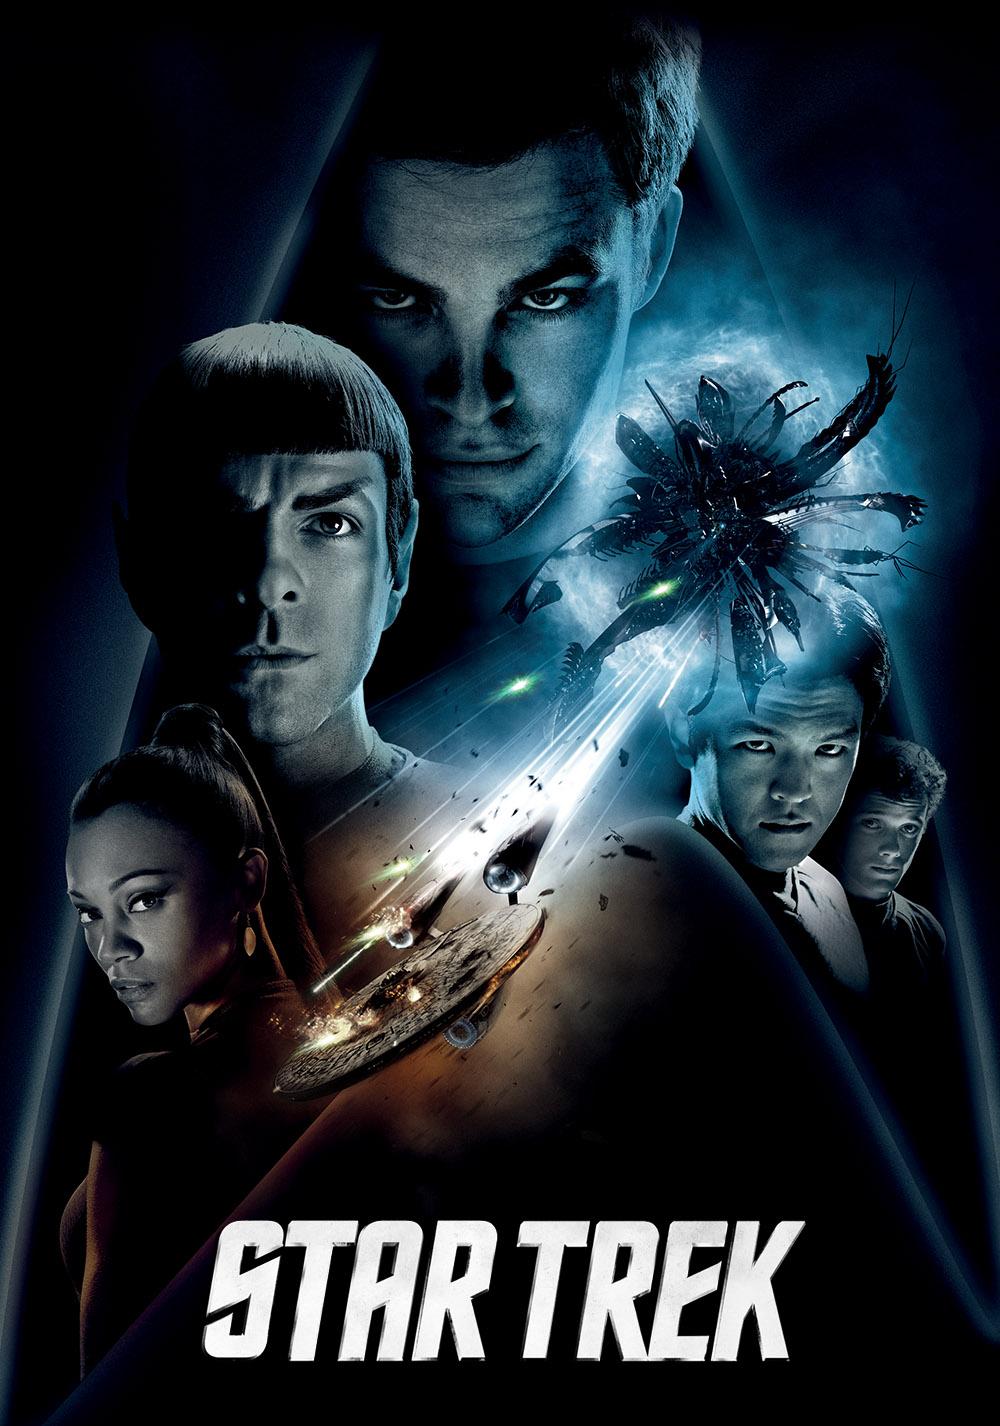 Movie Posters Star Trek Star Trek Movie Poster Image